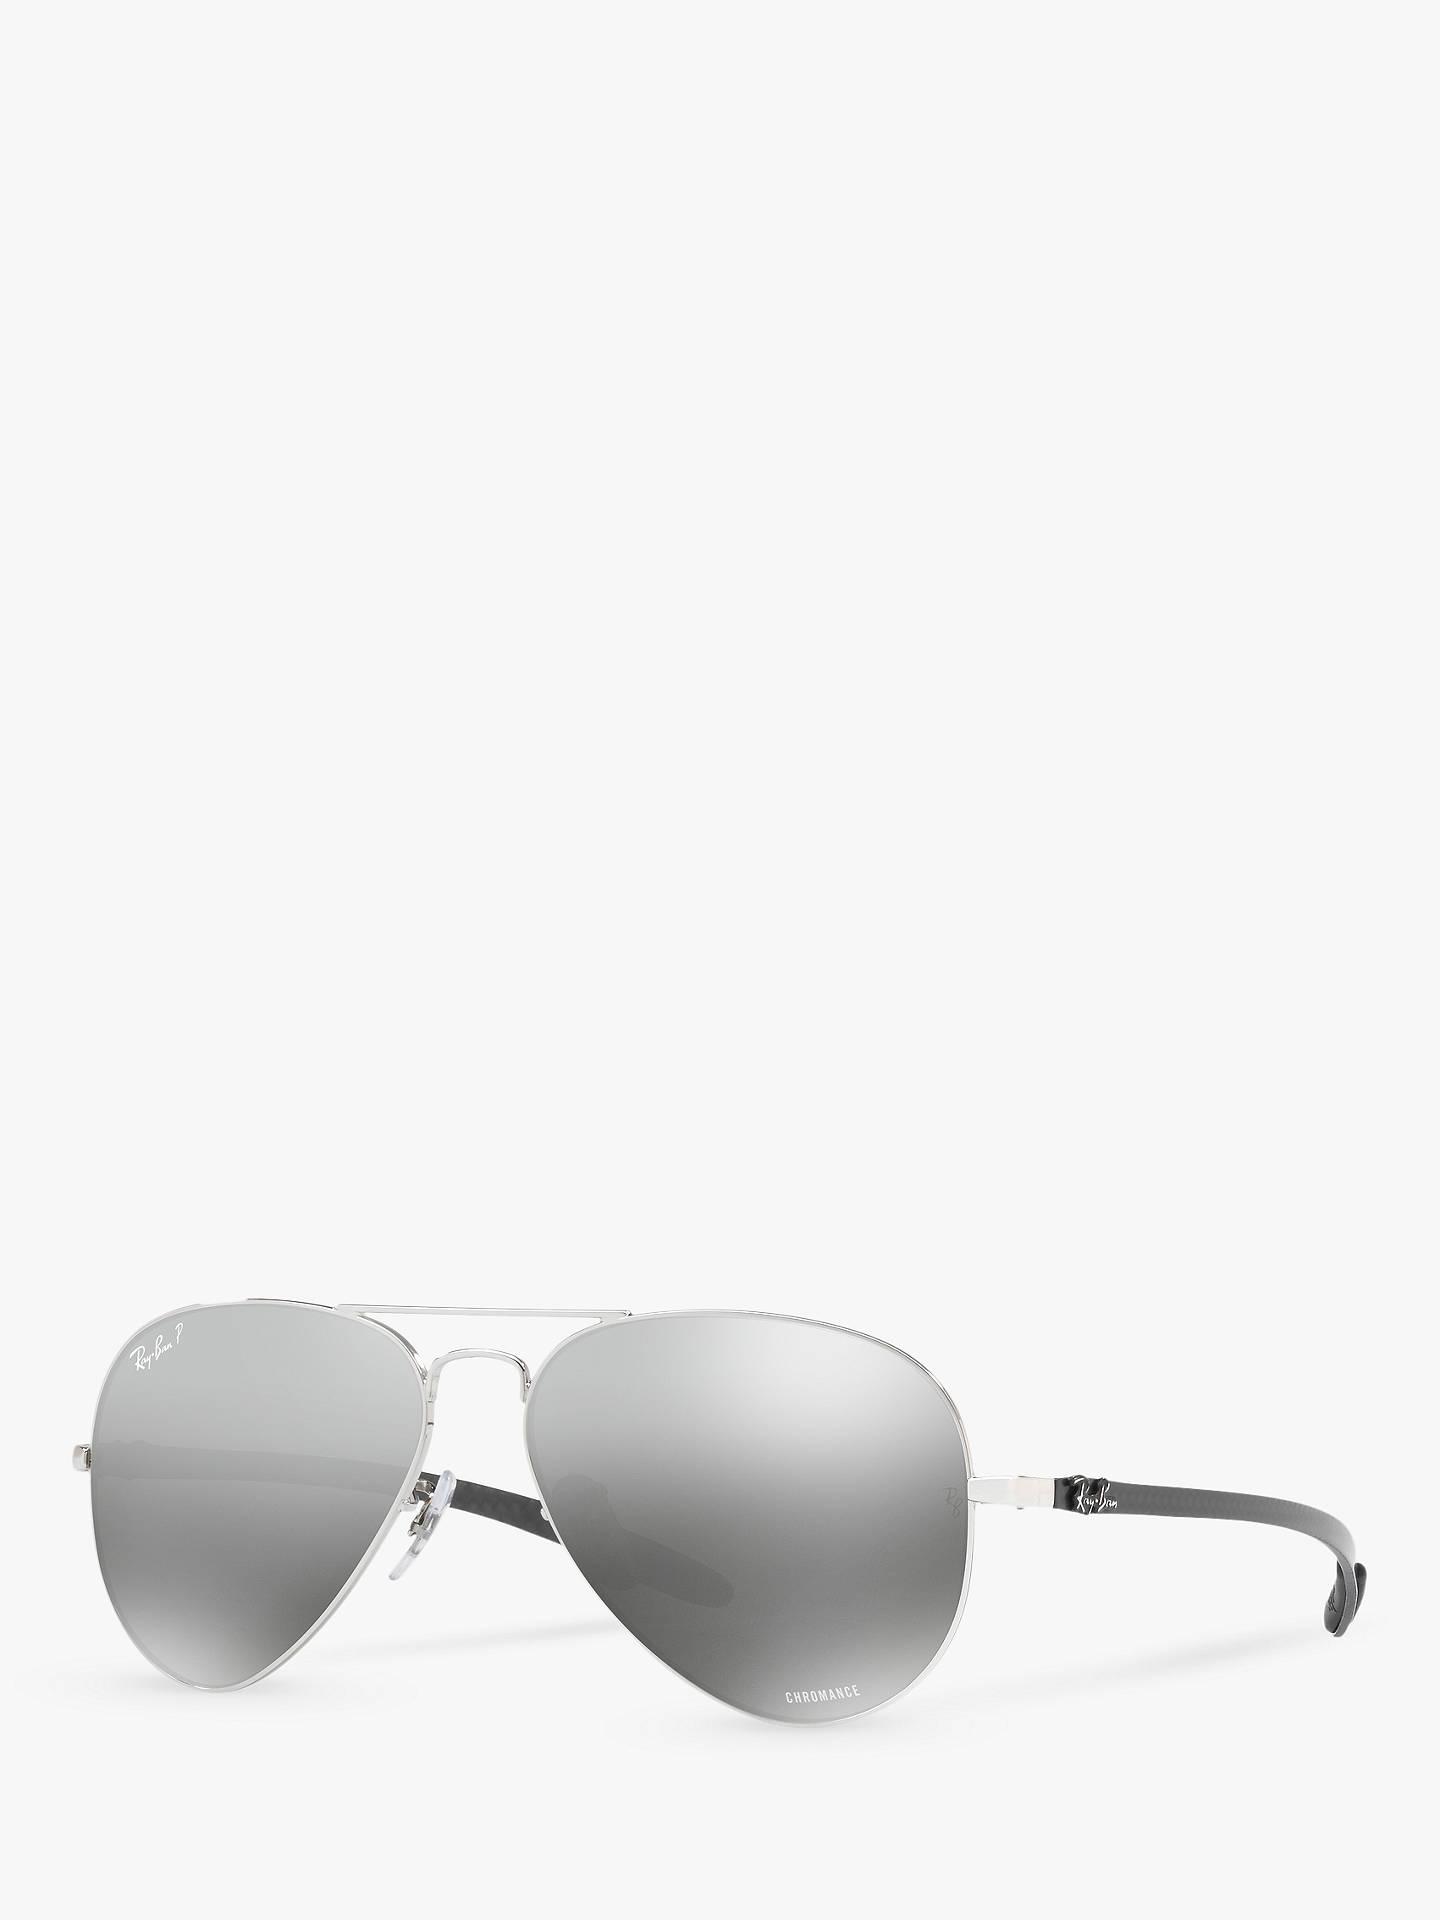 2bbd5df870a Buy Ray-Ban RB8317CH Chromance Polarised Aviator Sunglasses